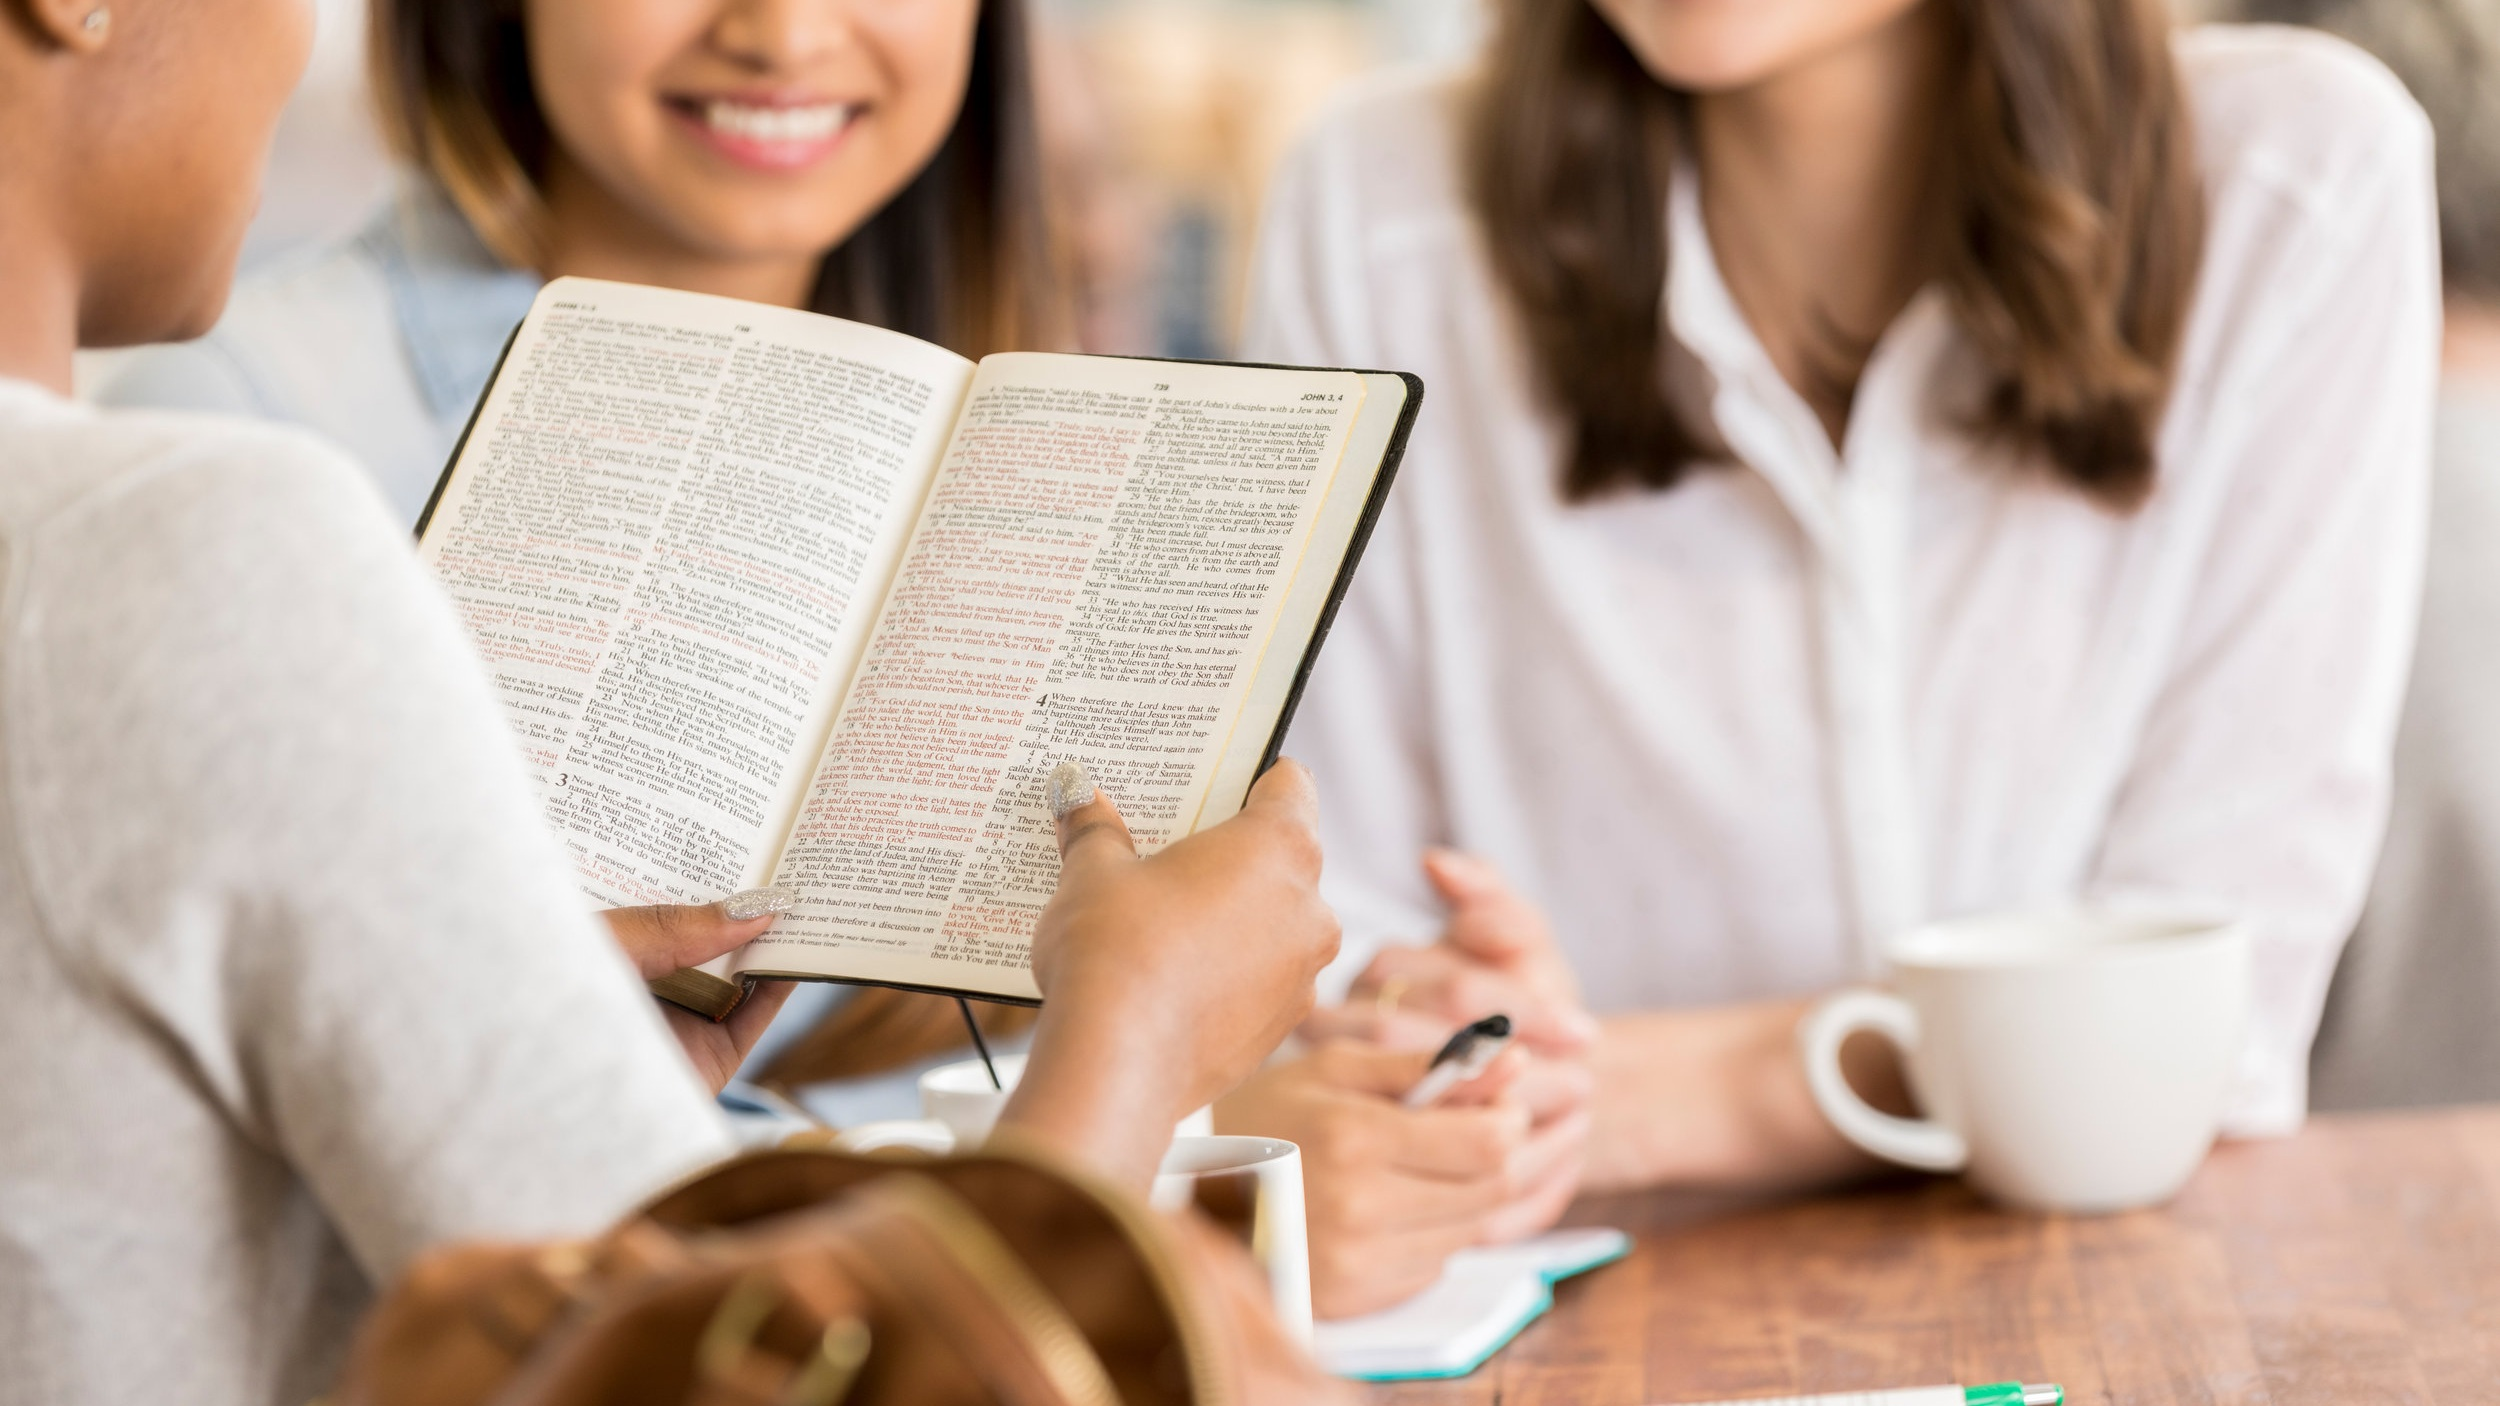 bible+study+group.jpg